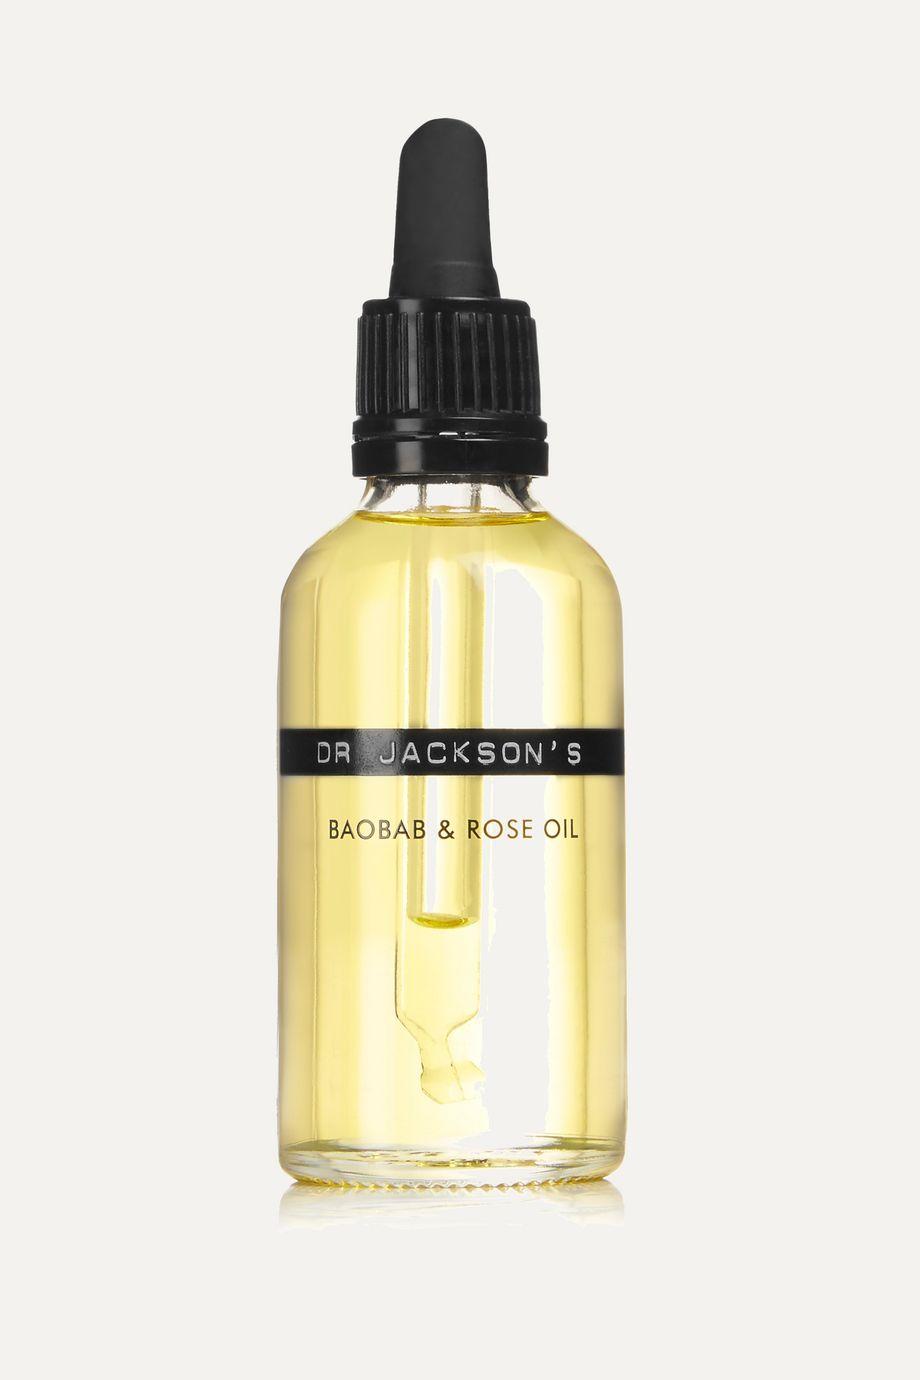 Dr. Jackson's Baobab & Rose Oil, 50ml